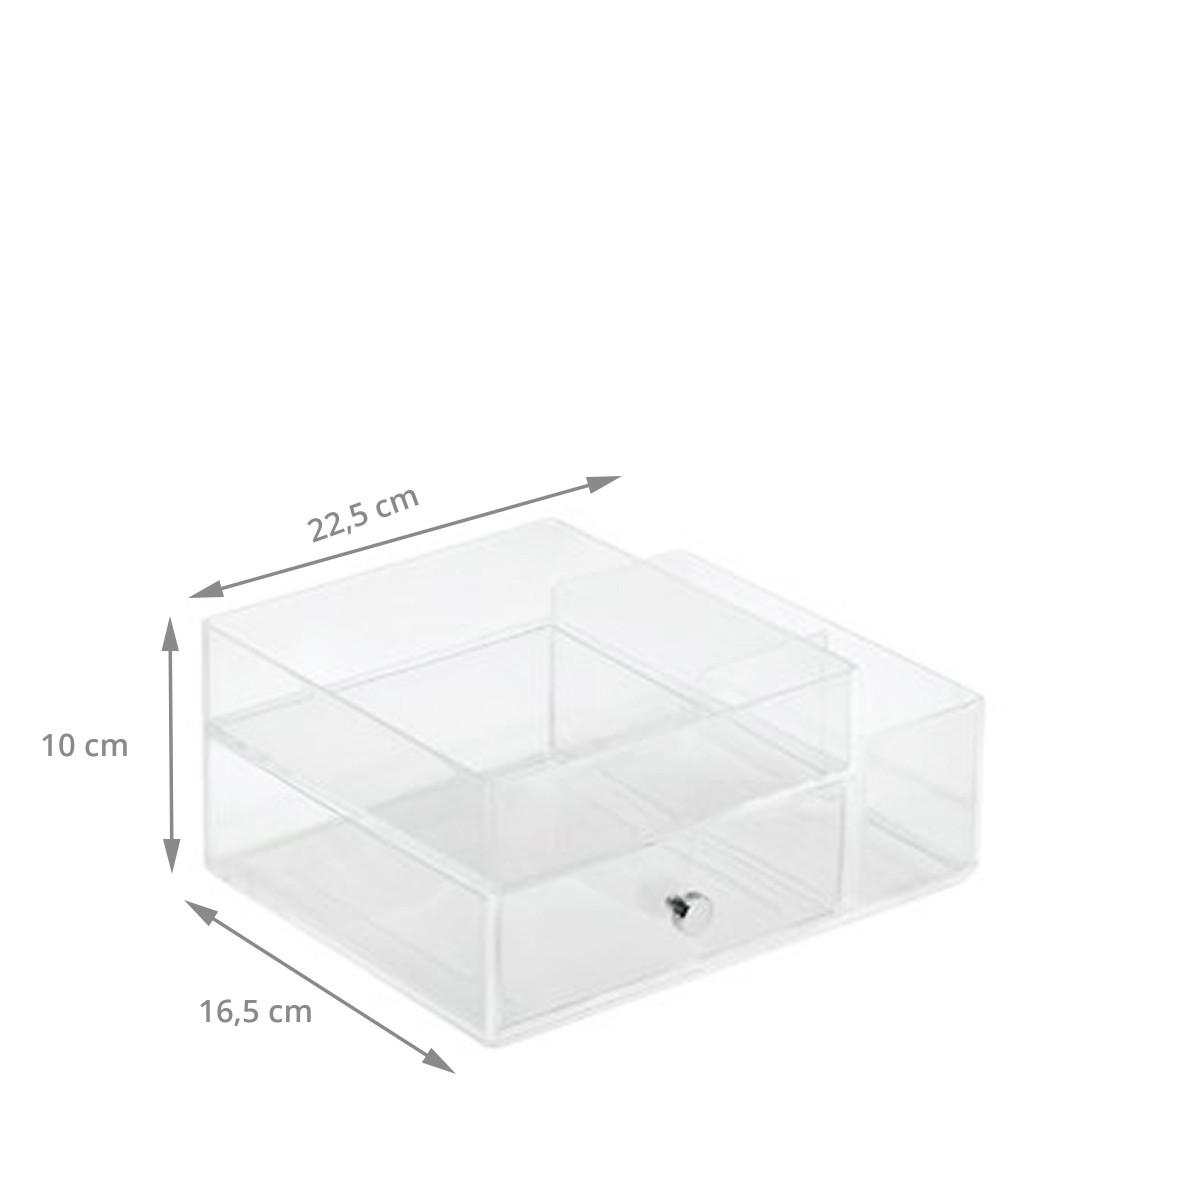 bo te acrylique transparent rangement maquillage. Black Bedroom Furniture Sets. Home Design Ideas